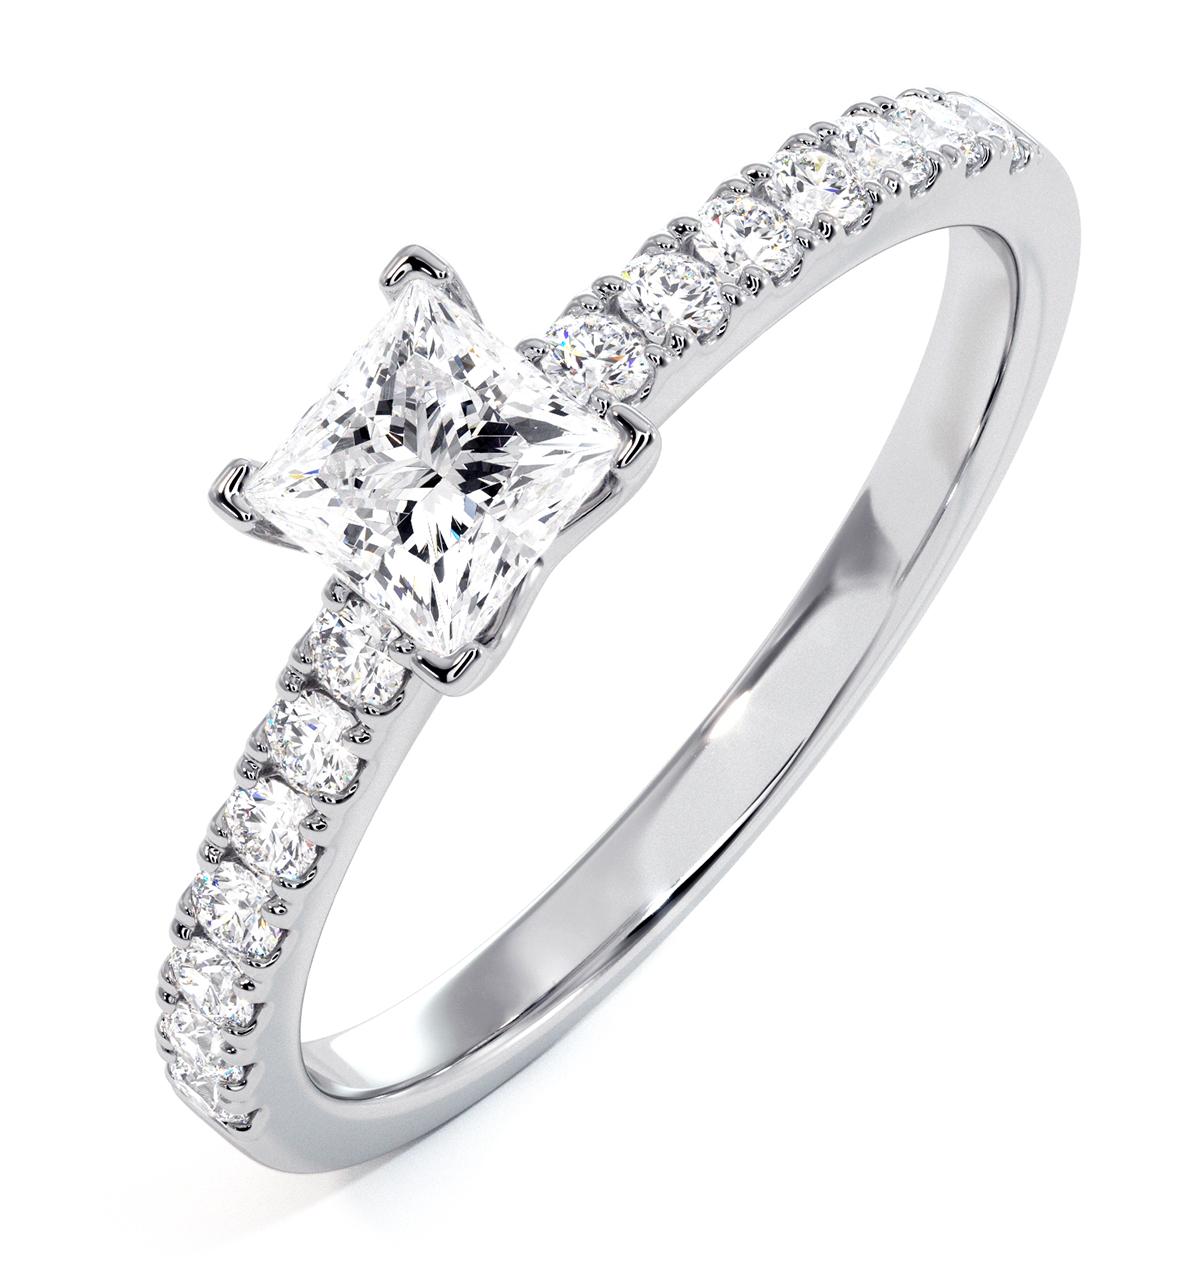 Katerina GIA Princess Diamond Engagement Ring Platinum 0.85ct G/SI2 - image 1